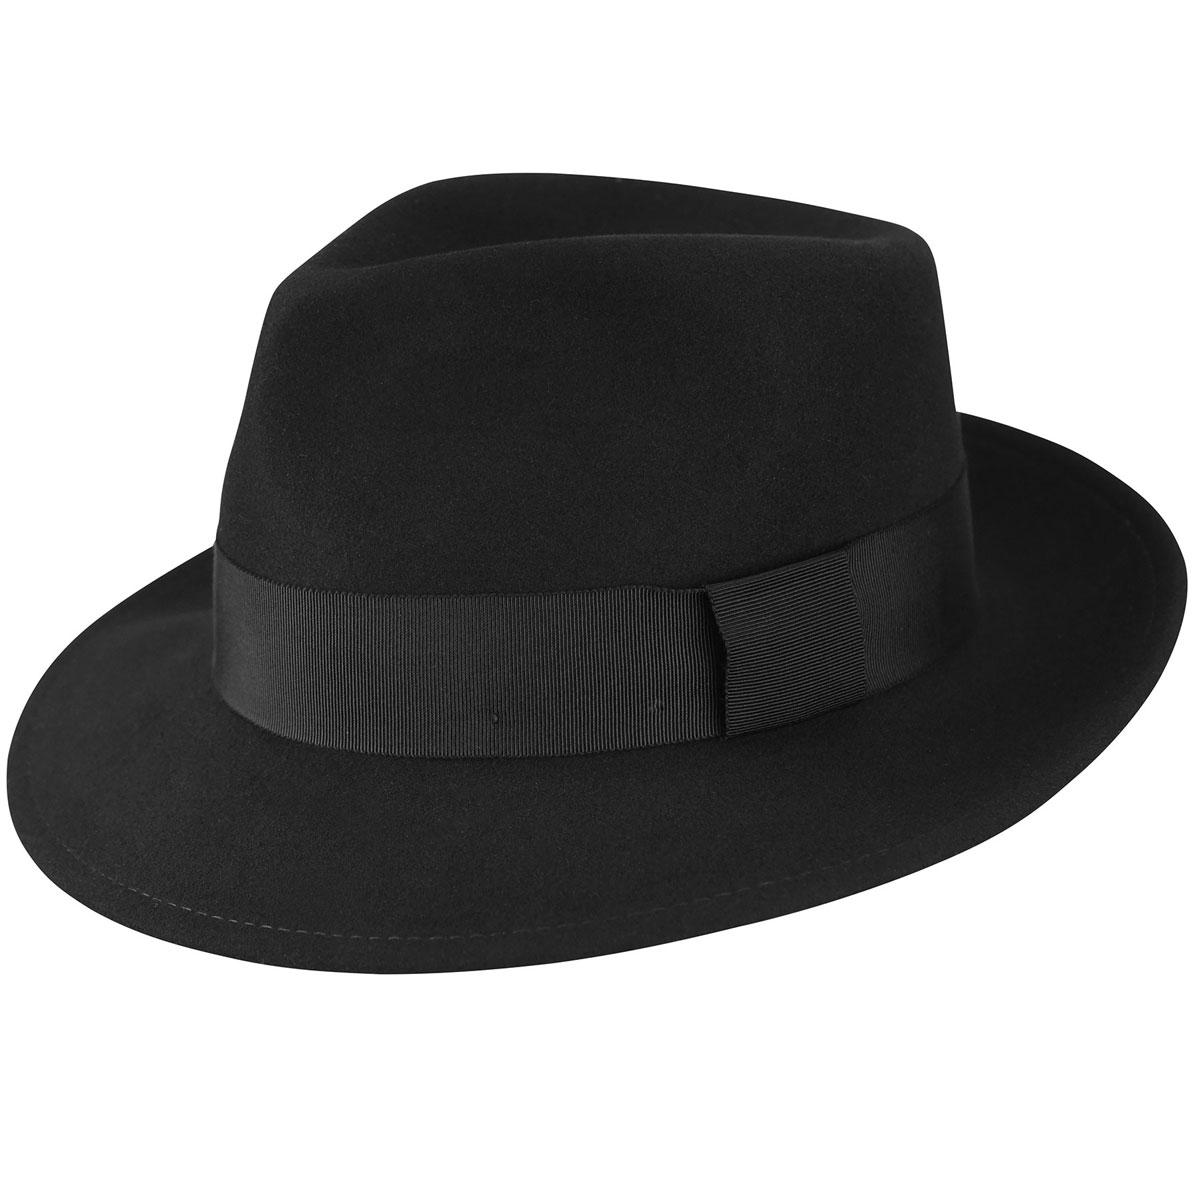 Pantropic Branson Litefelt Fedora in Black,Black